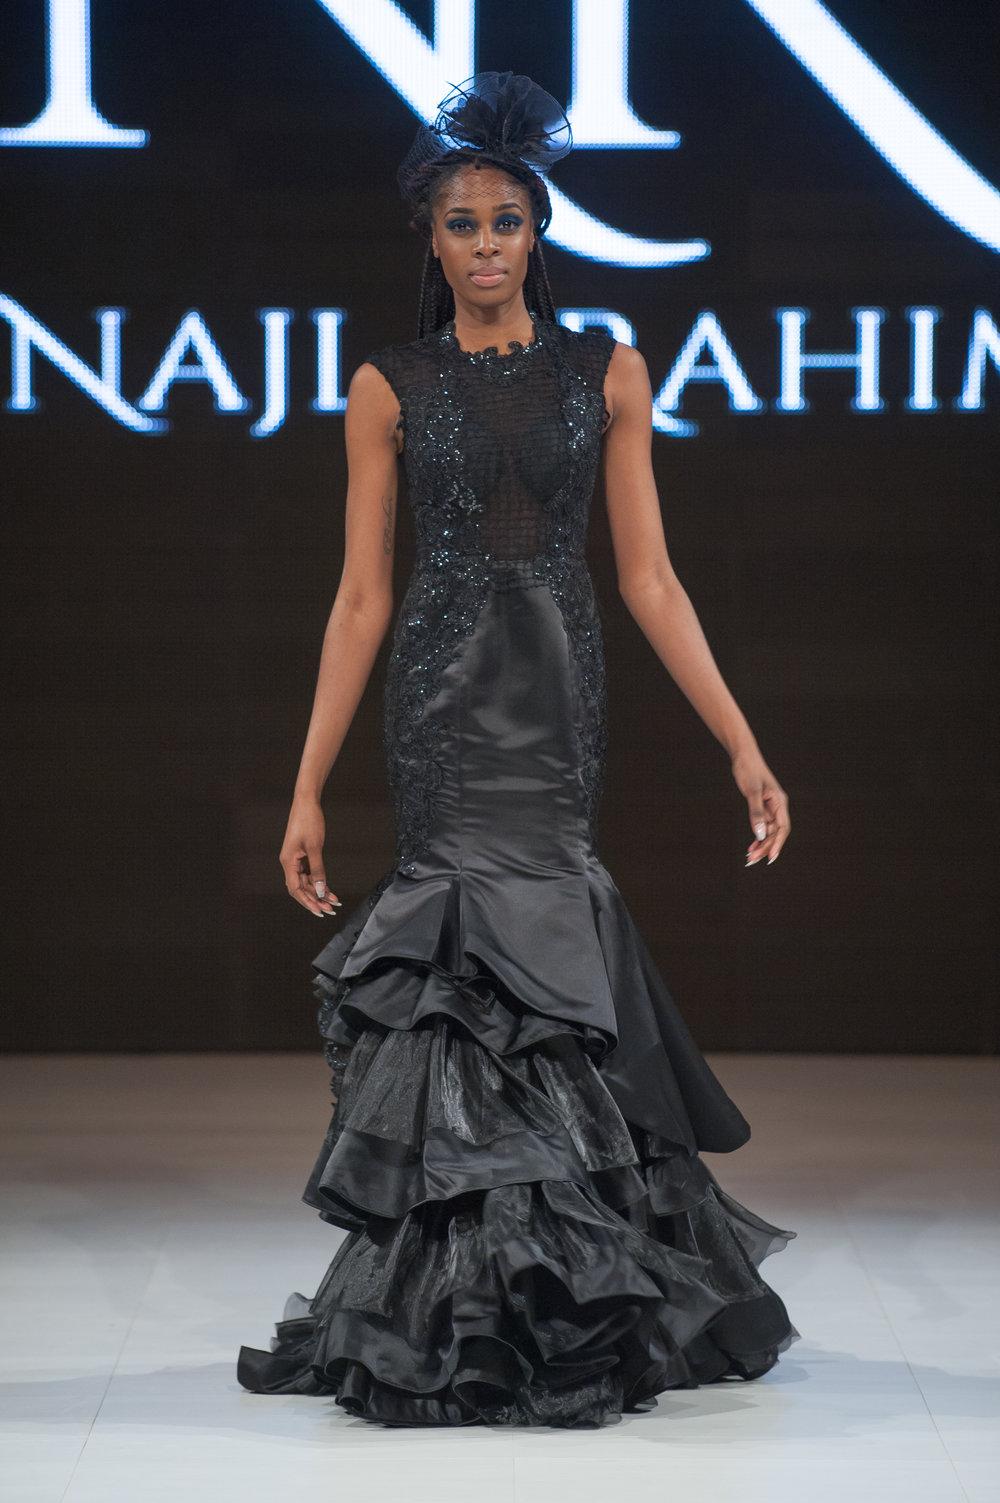 FAT2018-Day1-April17-Najla_Rahimi-Runway-Che_Rosales-LARAWAN-6155.jpg